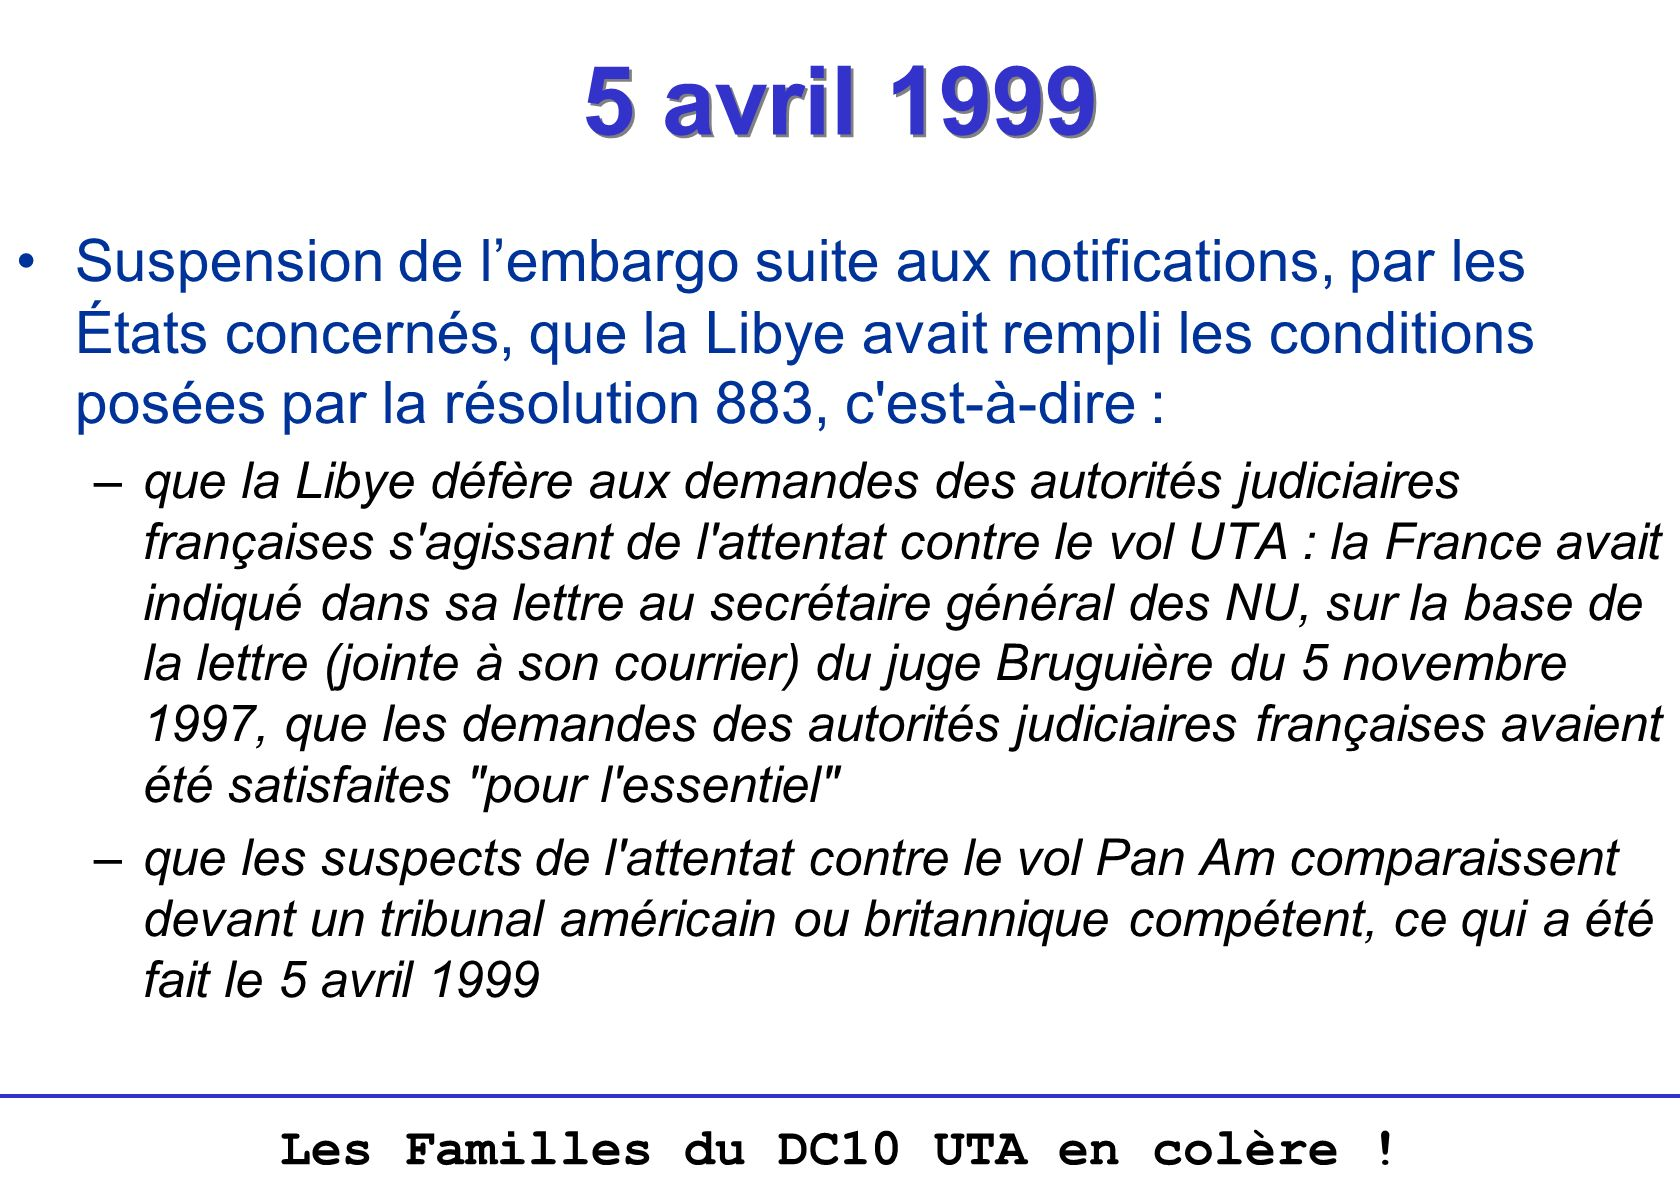 5 avril 1999